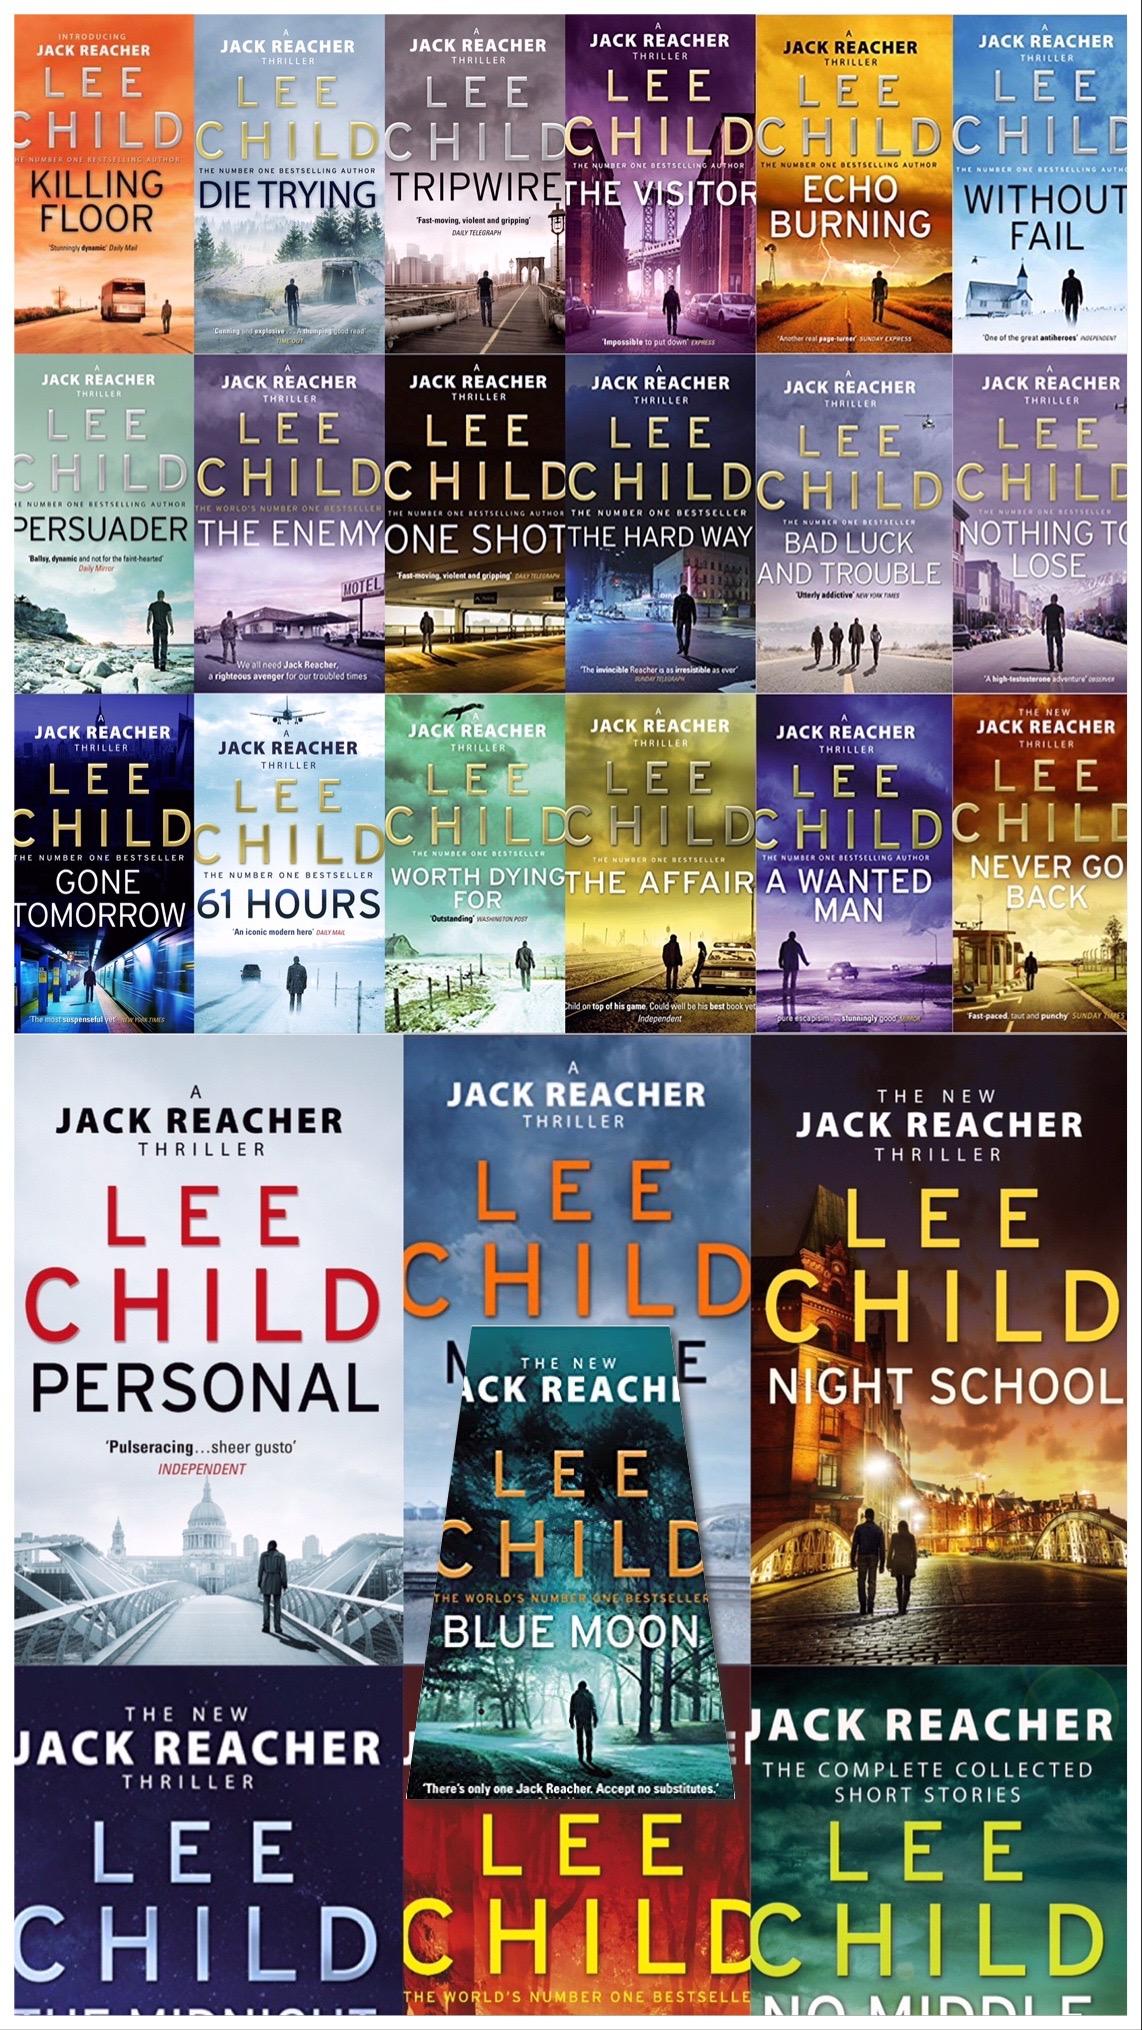 Jack Reacher Complete set (Books 1-24)